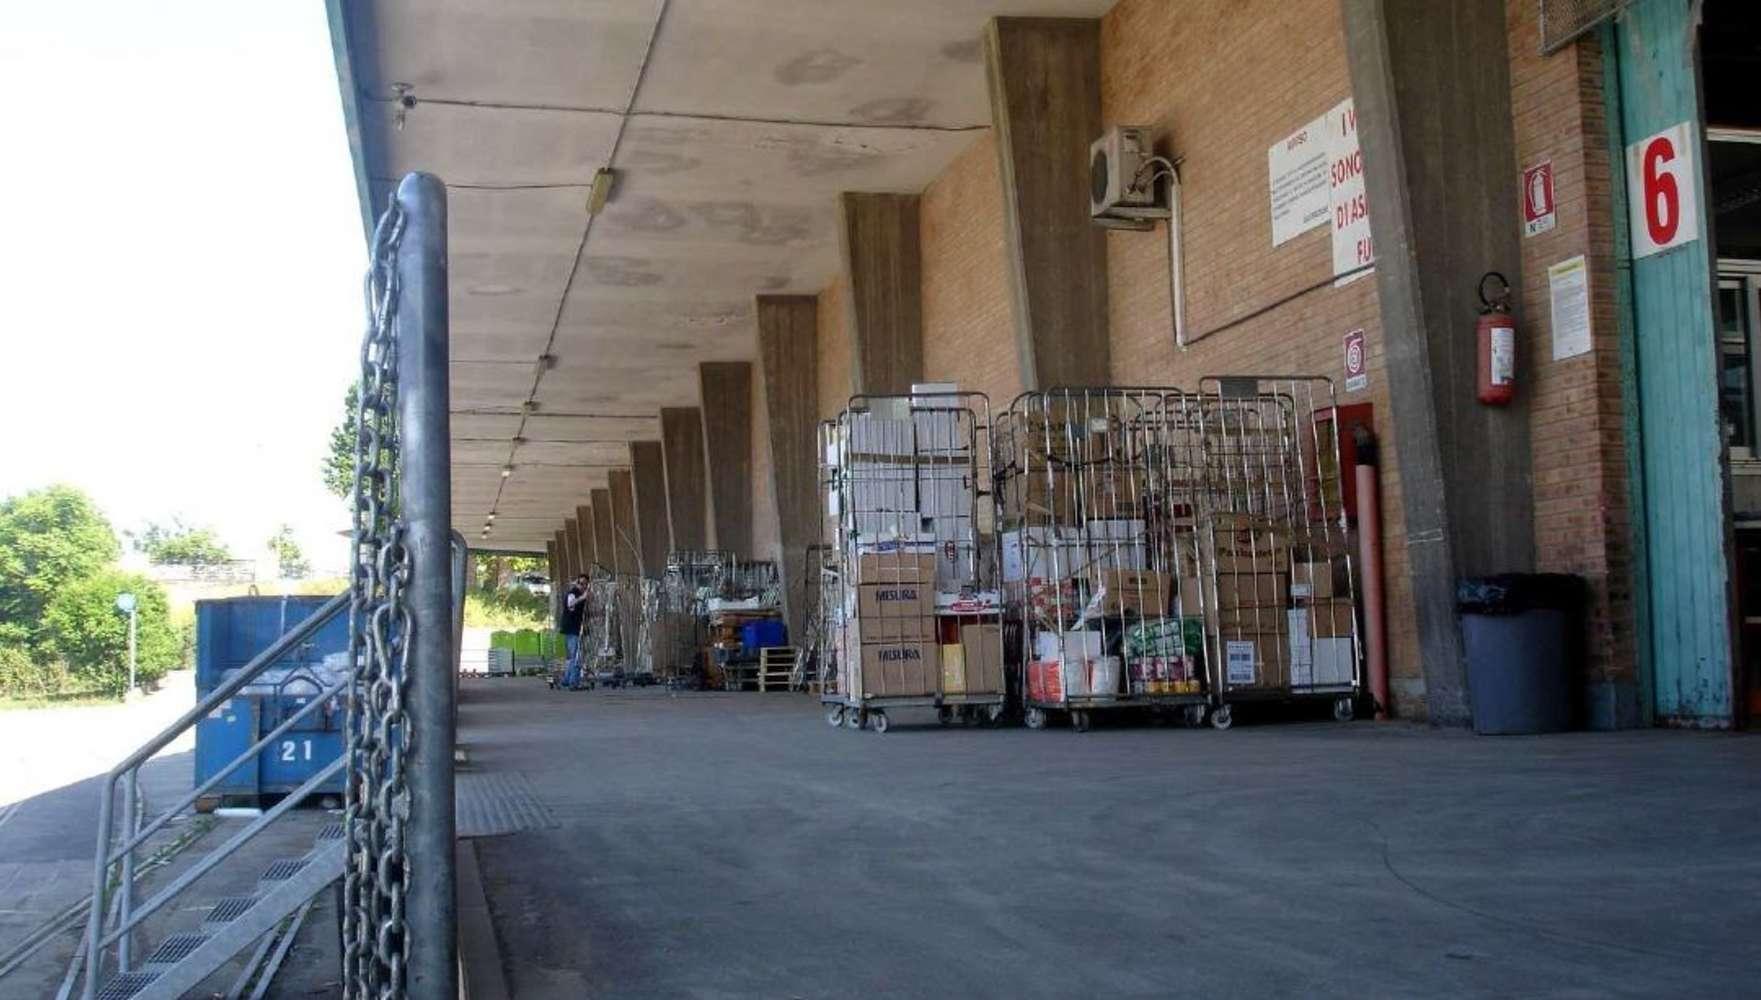 Magazzini industriali e logistici Cesena, 47521 - Cesena Warehouse - 9212974